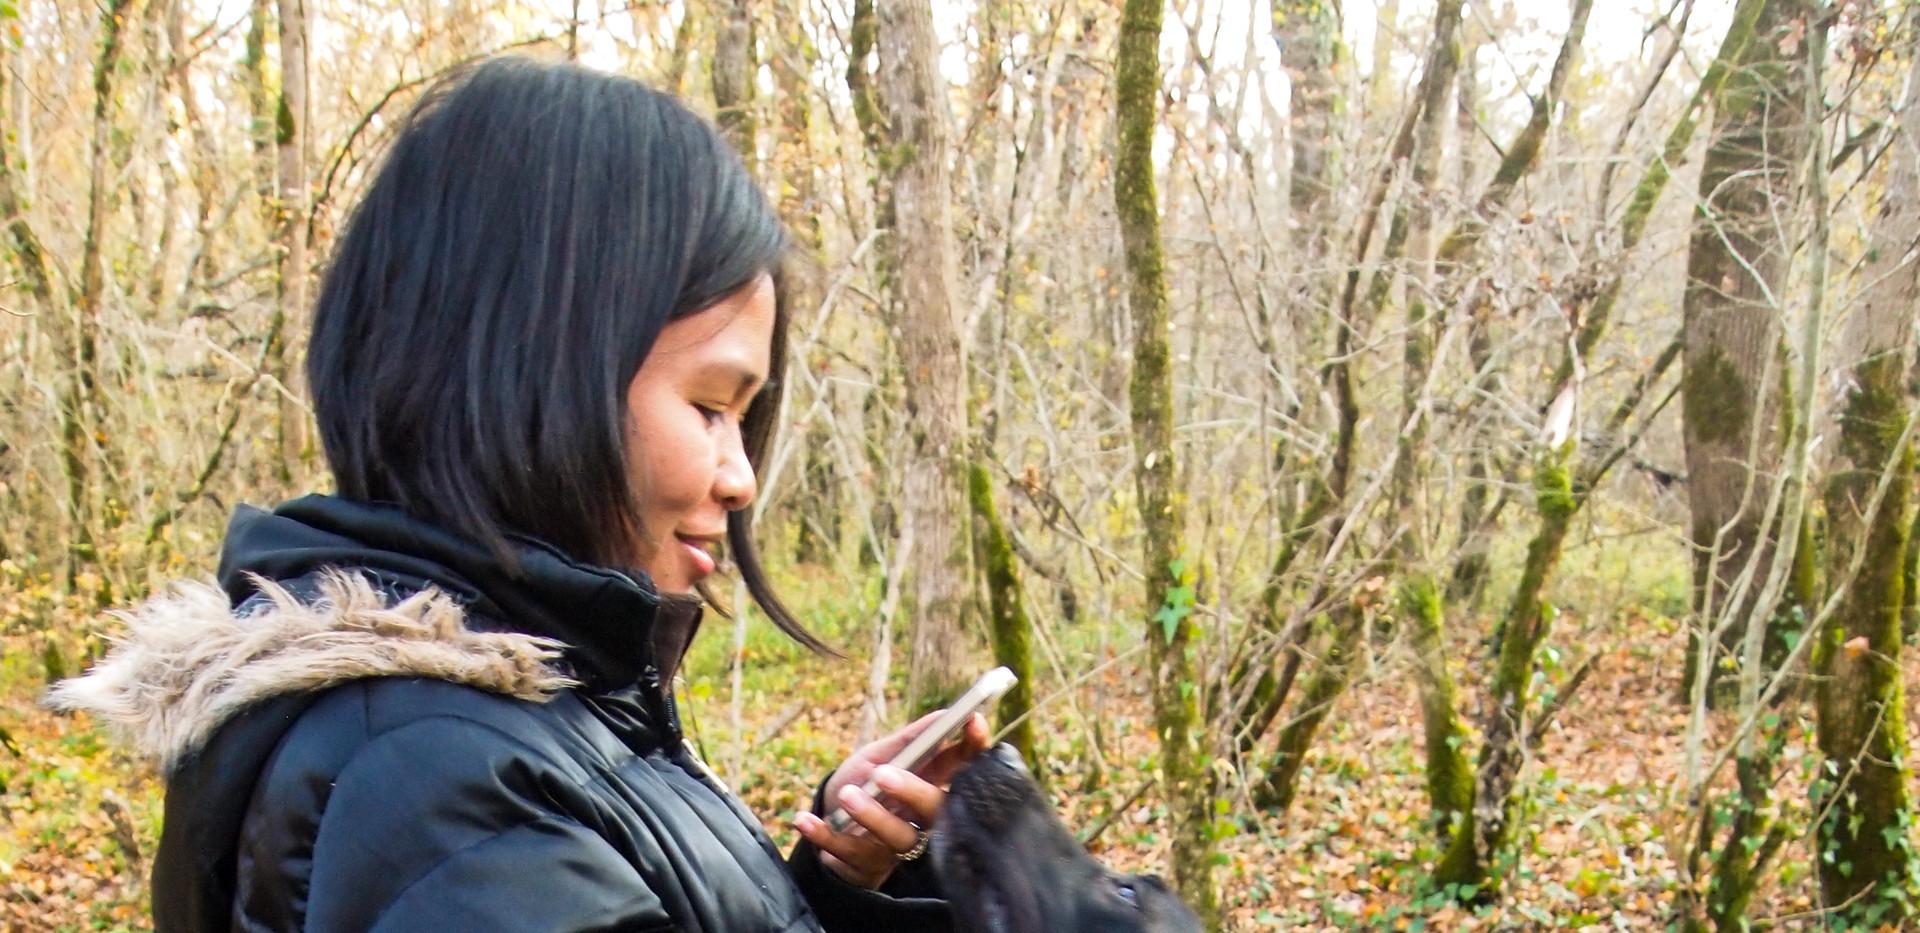 White Truffle Hunting with Simon Majumdar